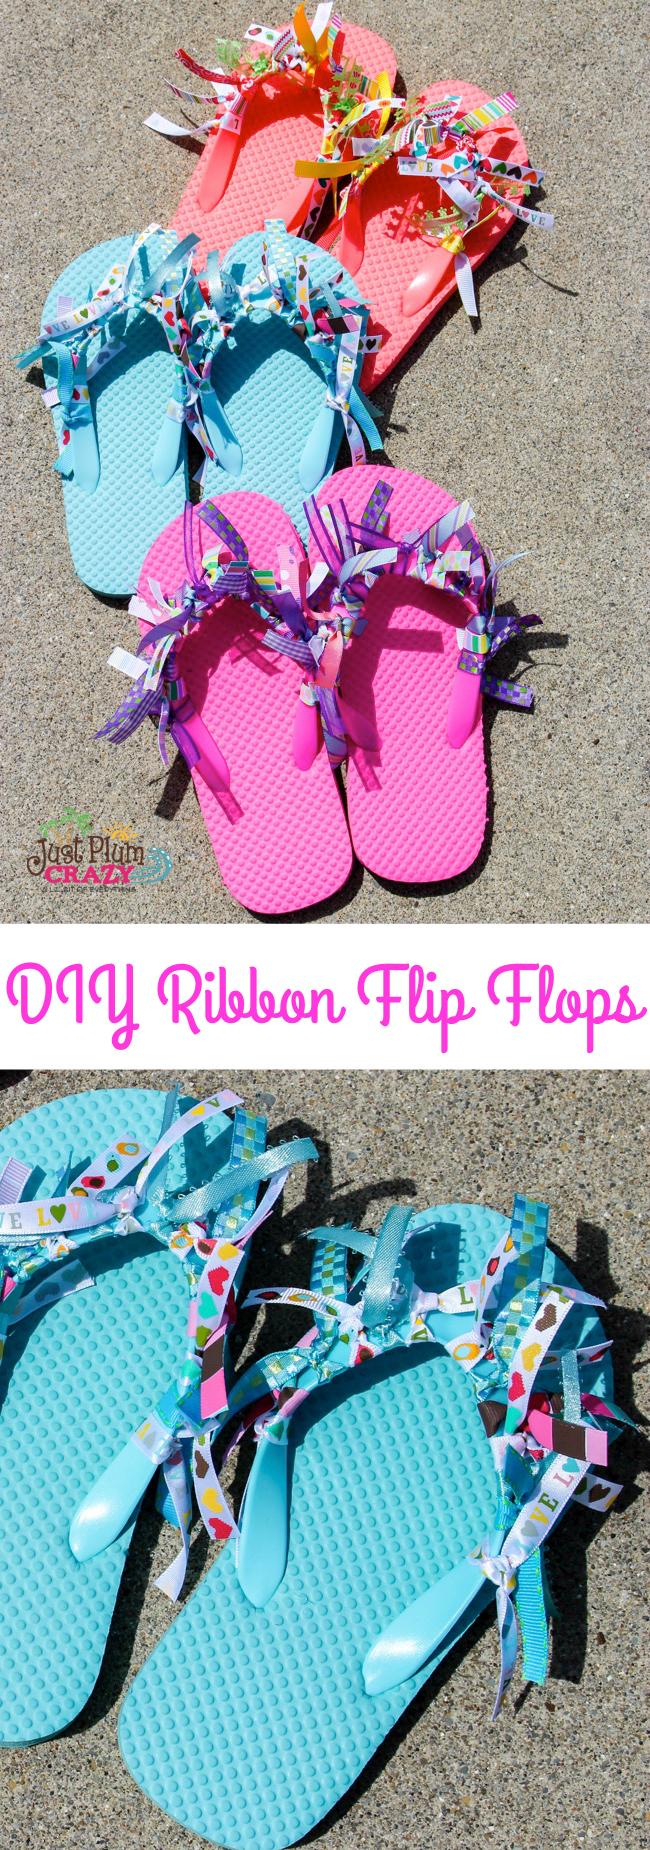 DIY Flip Flips with Ribbons